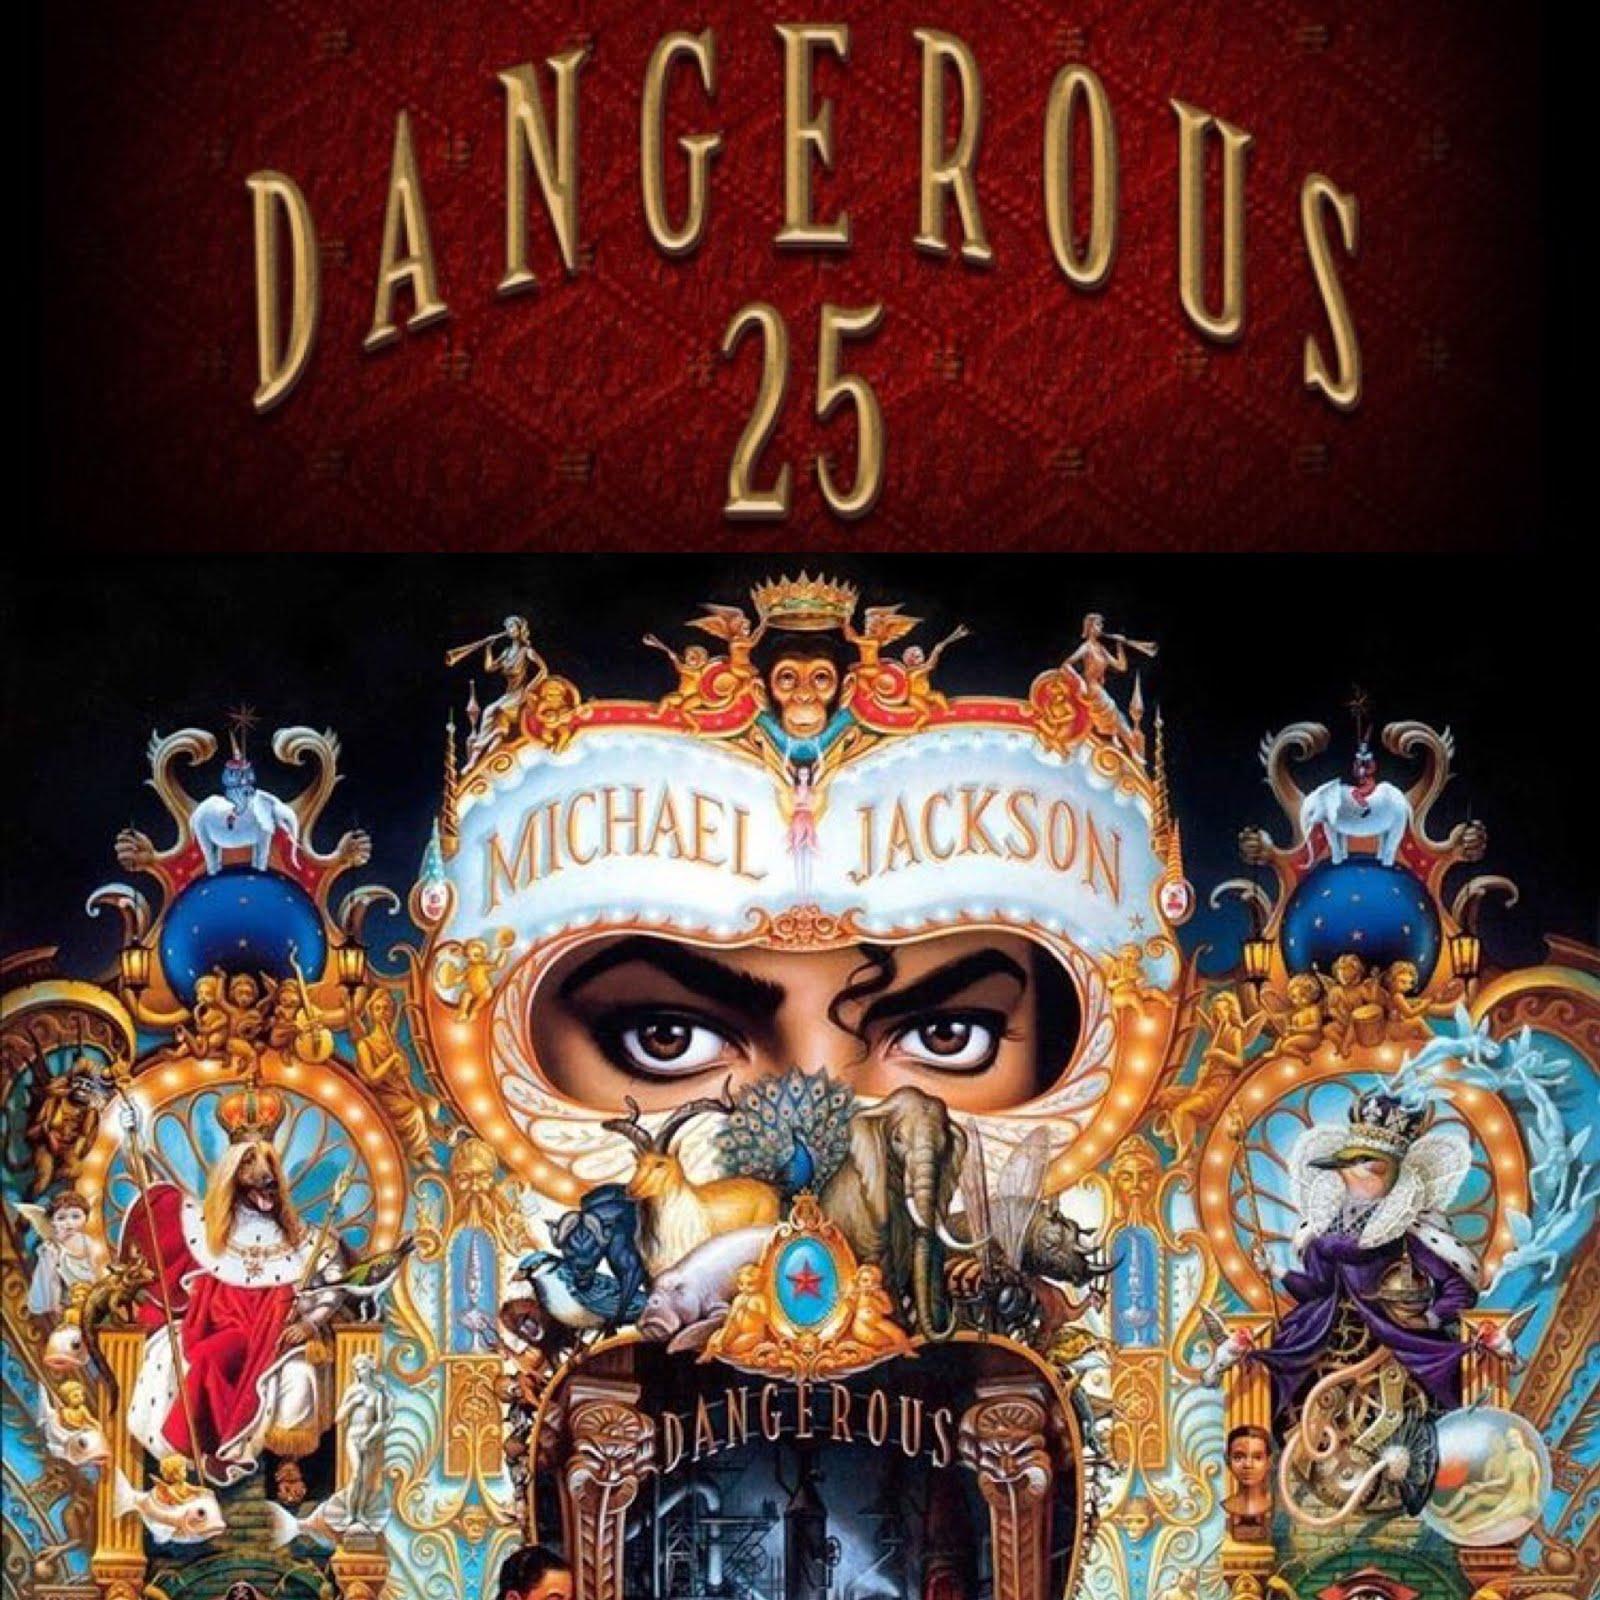 DANGEROUS 25